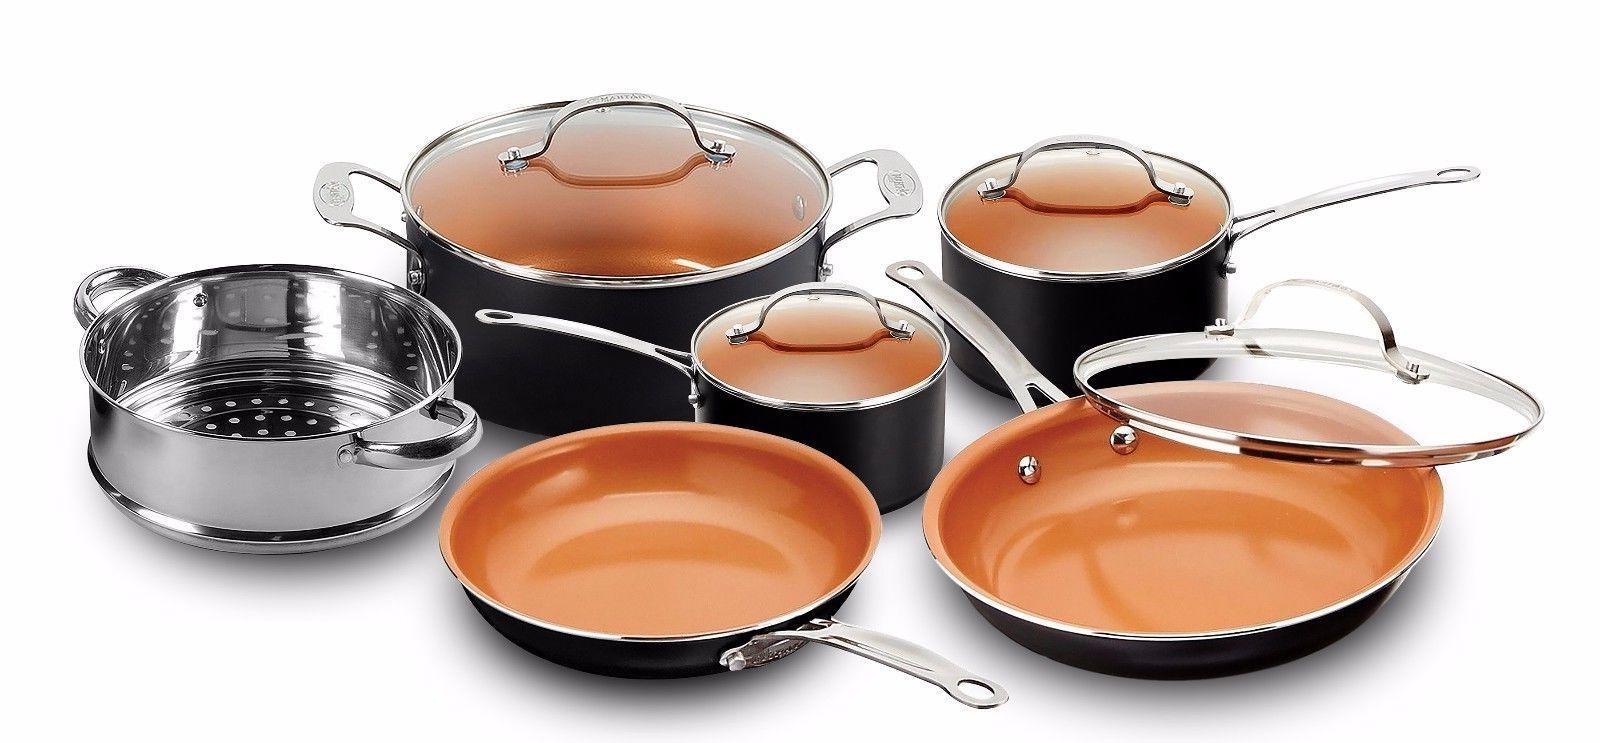 Nonstick Cookware Set Colors -NEW